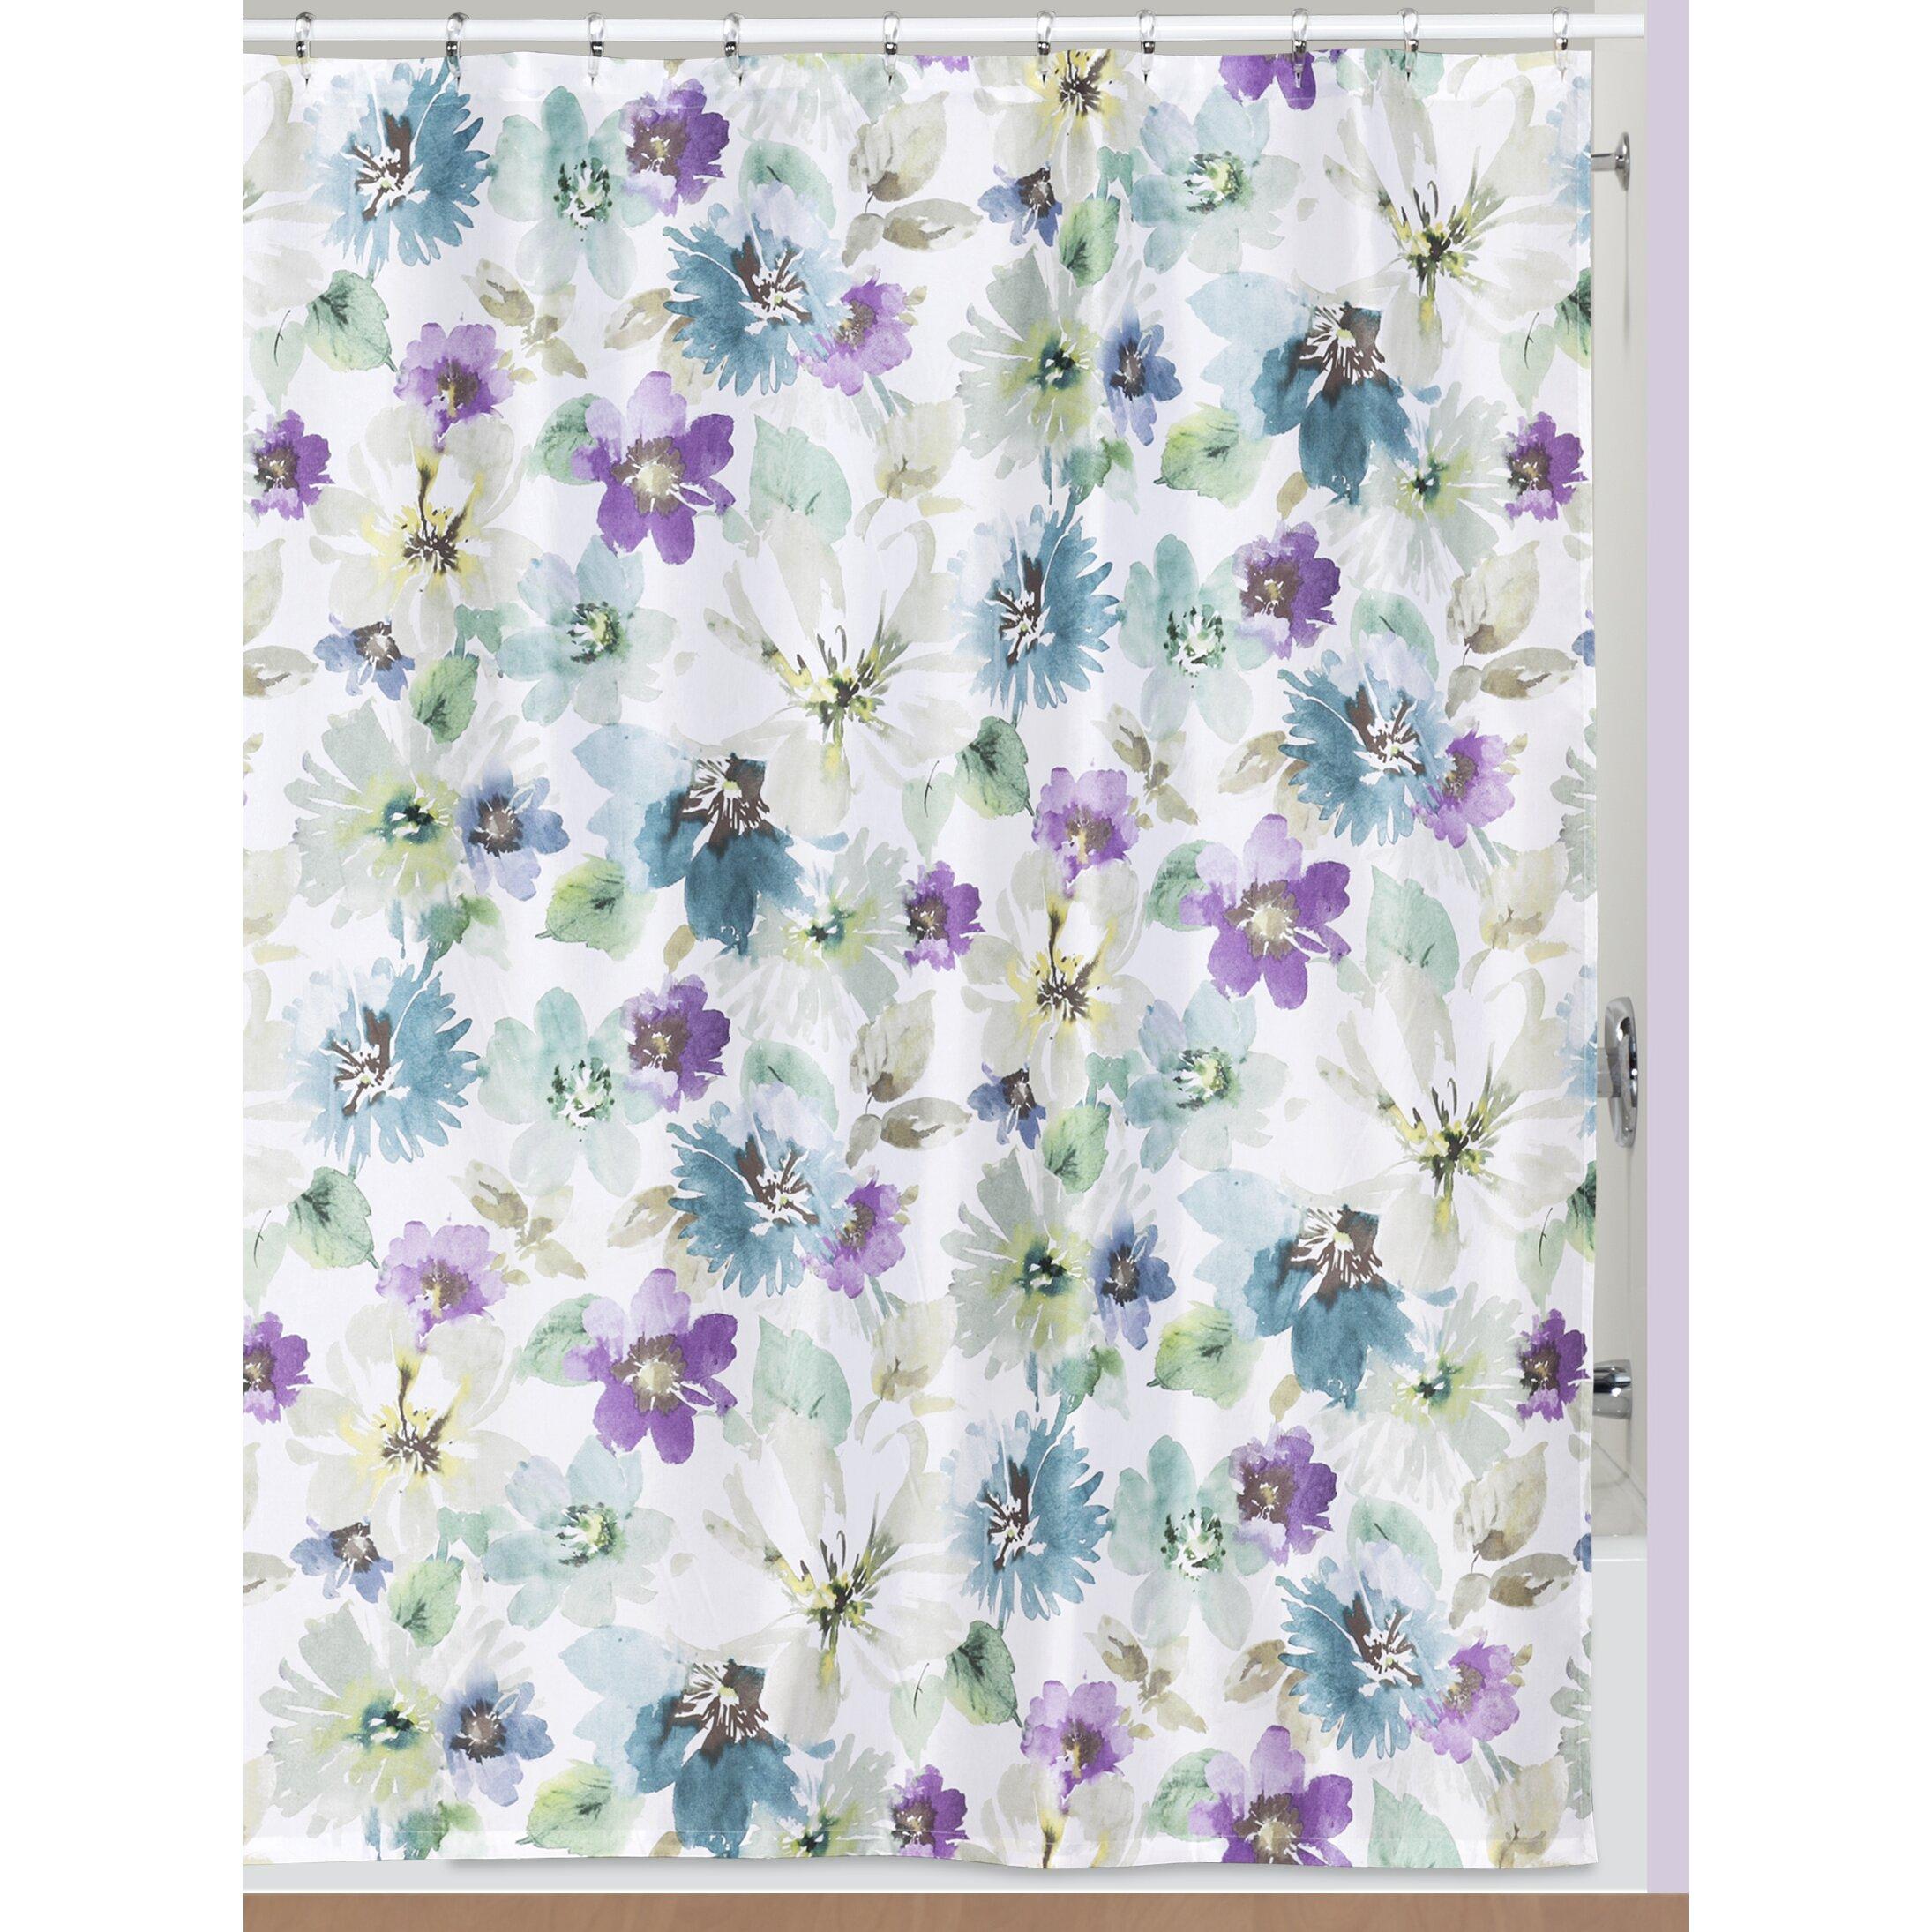 creative bath bouquet shower curtain amp reviews wayfair creative bath garden gate shower curtain amp reviews wayfair